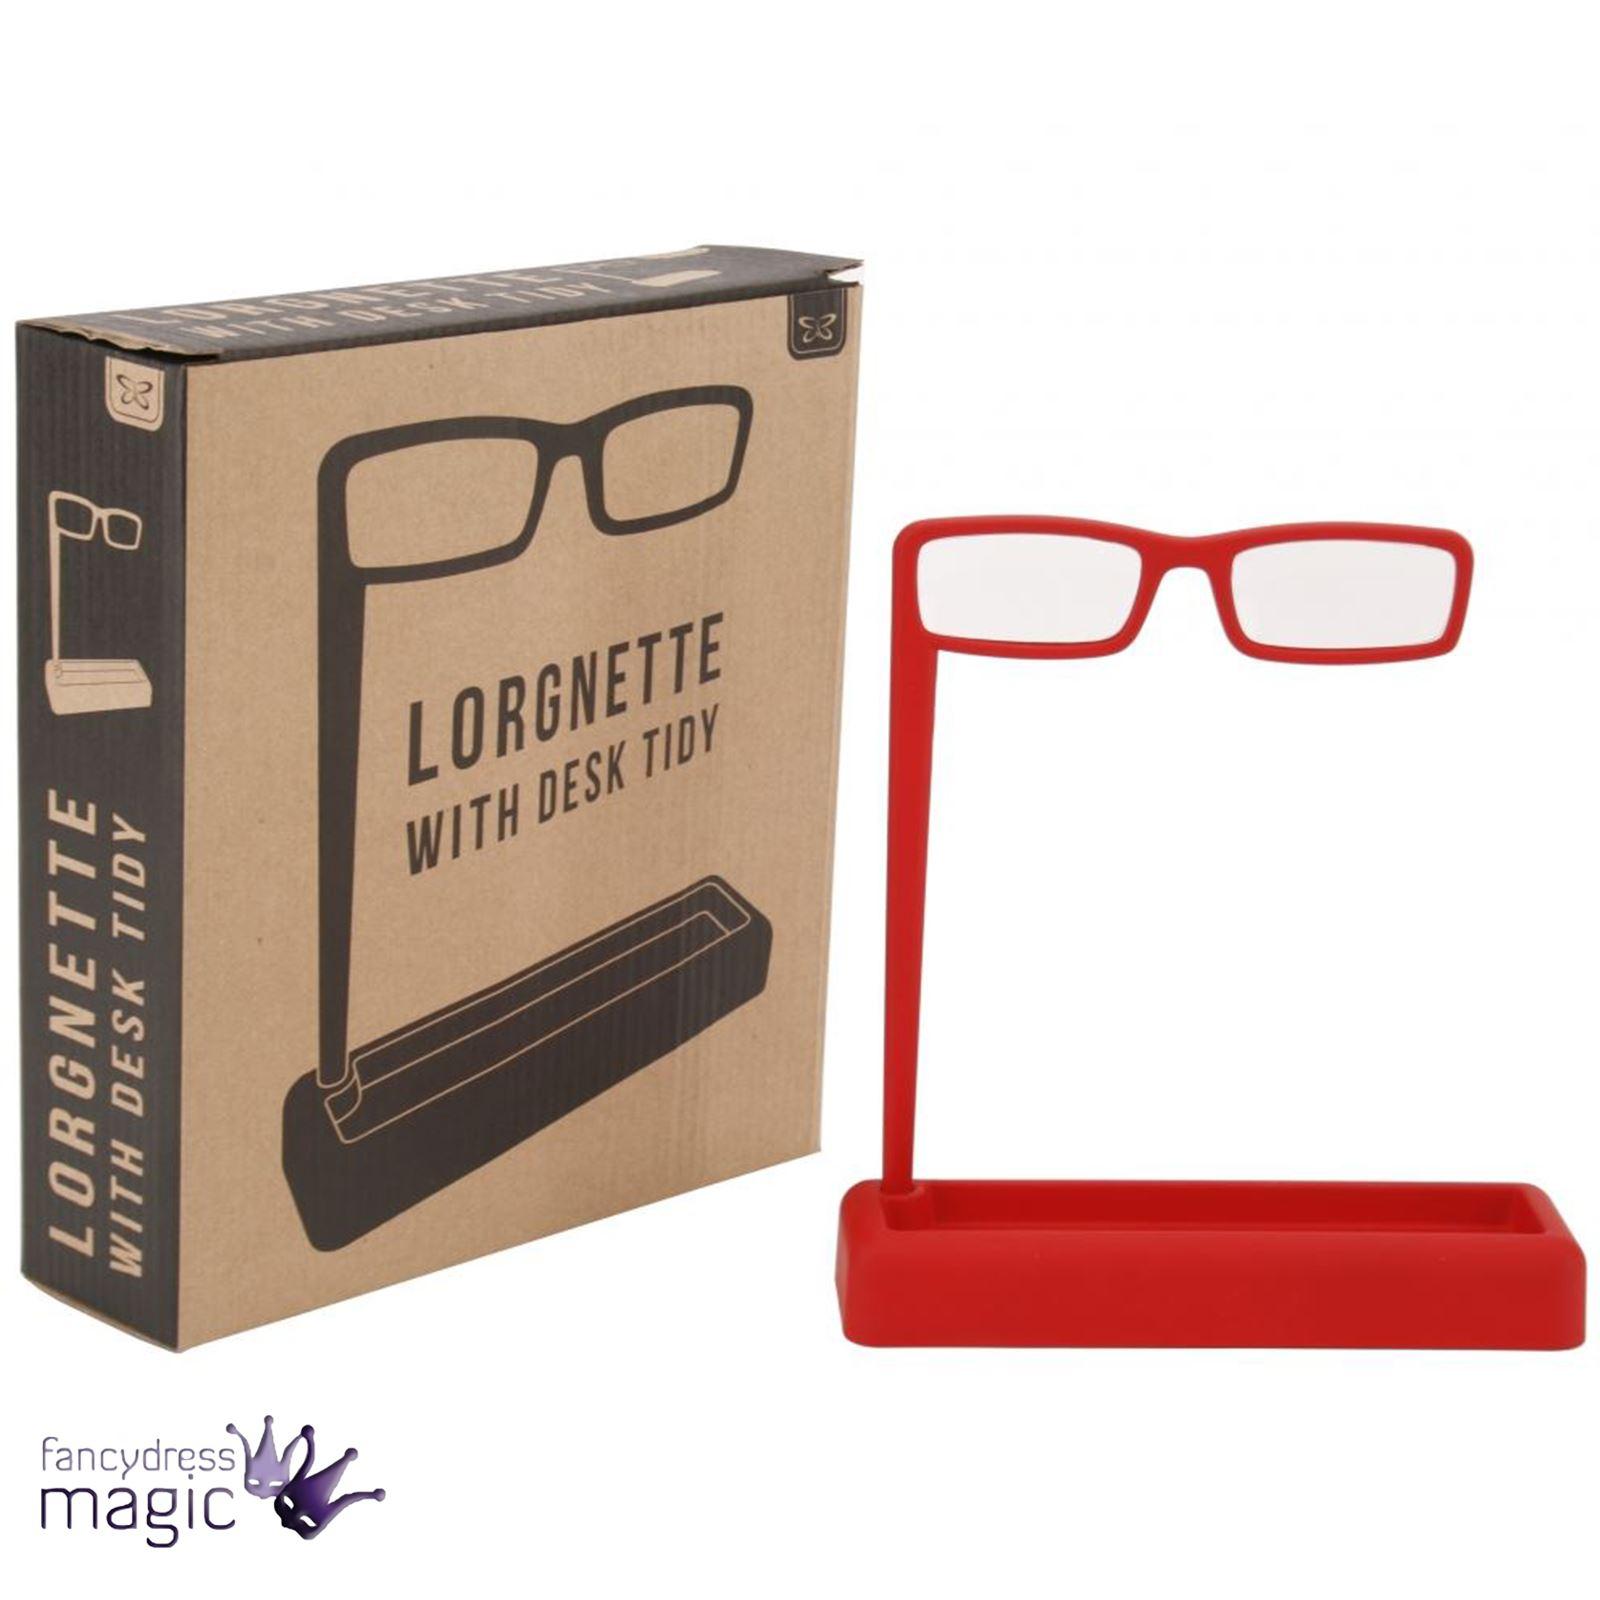 9cec5f4105b Nerd Chic Opera Lorgnette Glasses Desk Tidy Set Office Desk Stationery Home  Gift